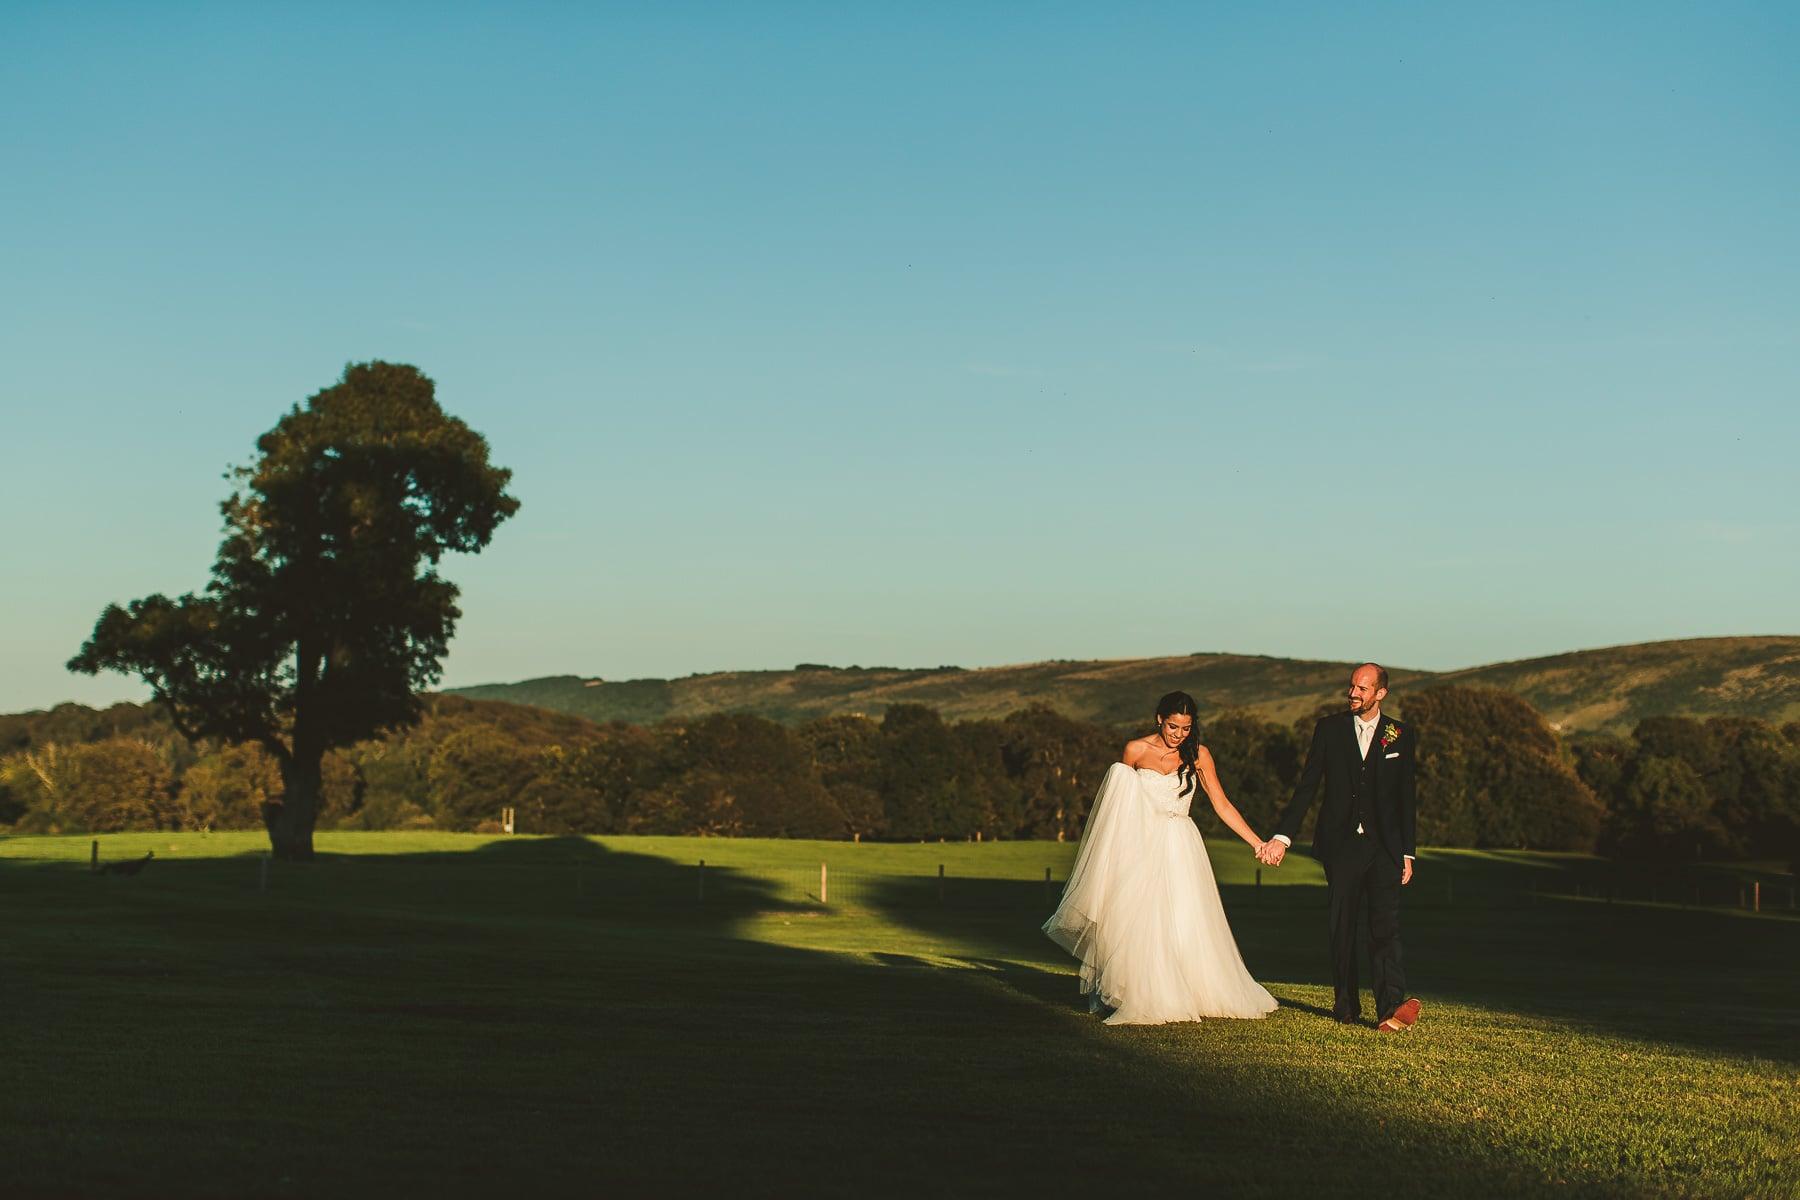 Sunset-wedding-portrait-Lulworth-Castle-Dorset